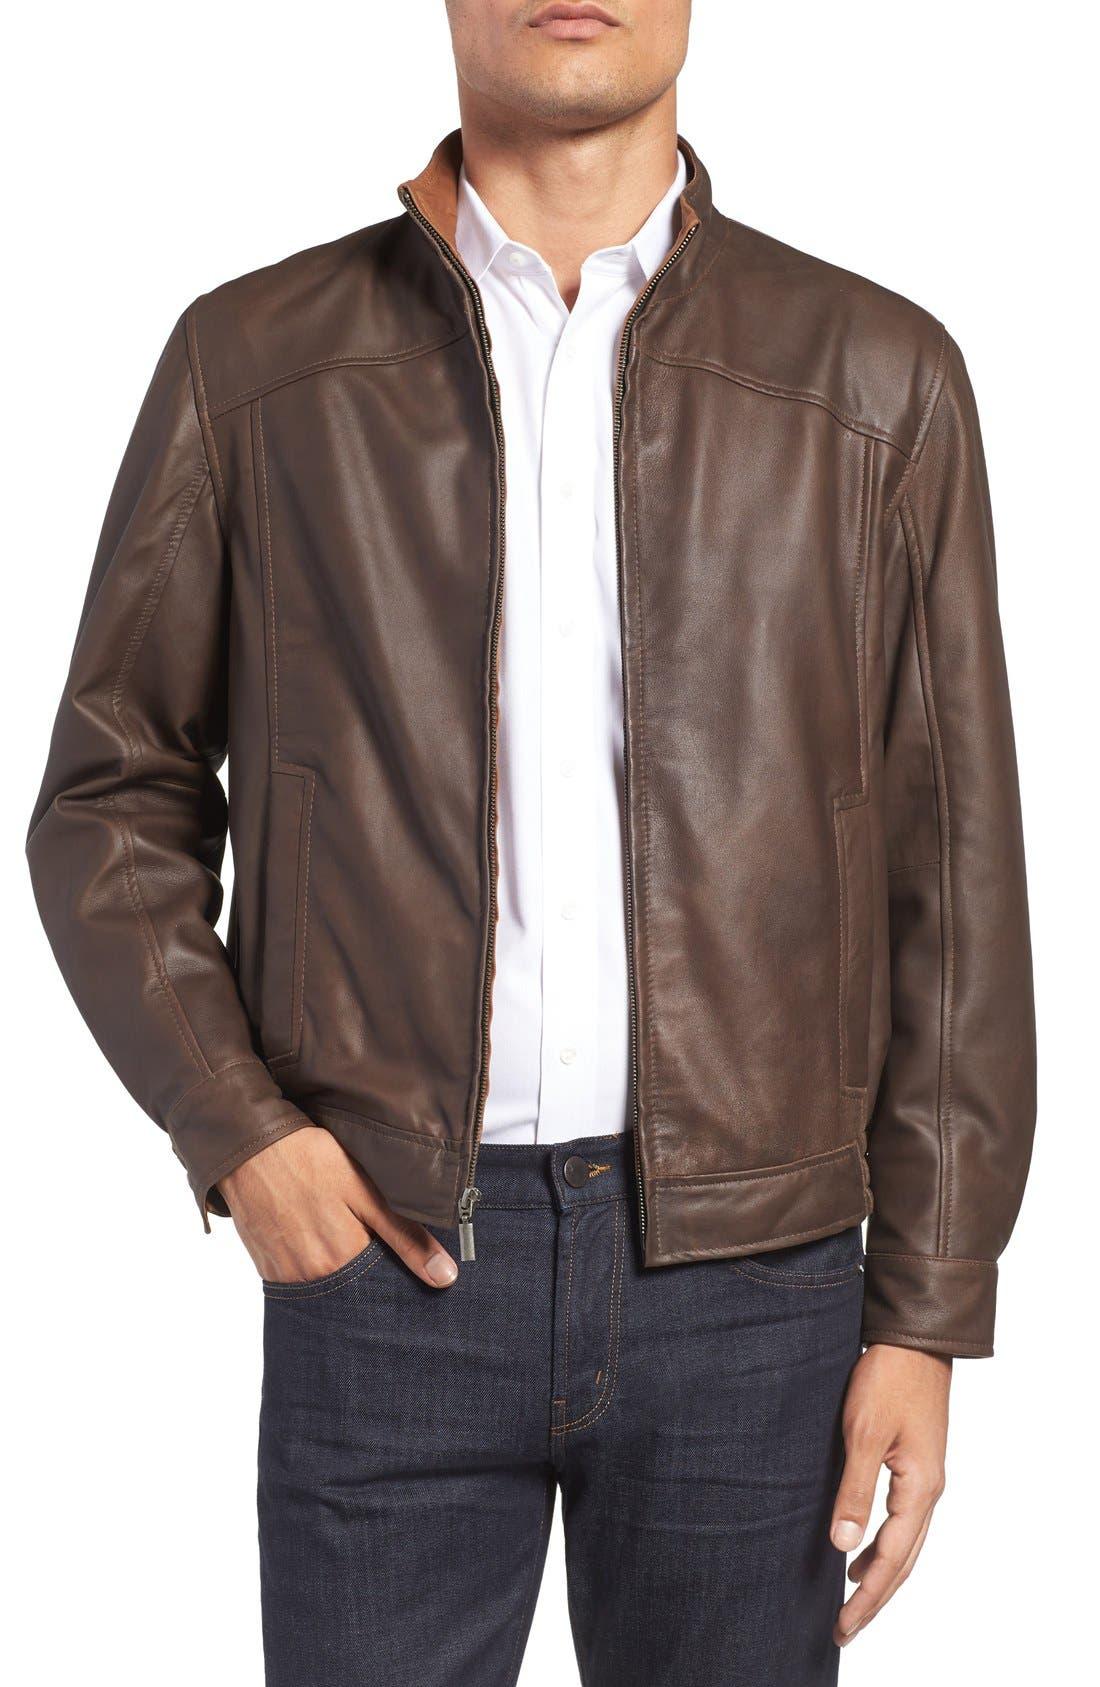 Alternate Image 1 Selected - Missani Le Collezioni Leather Bomber Jacket